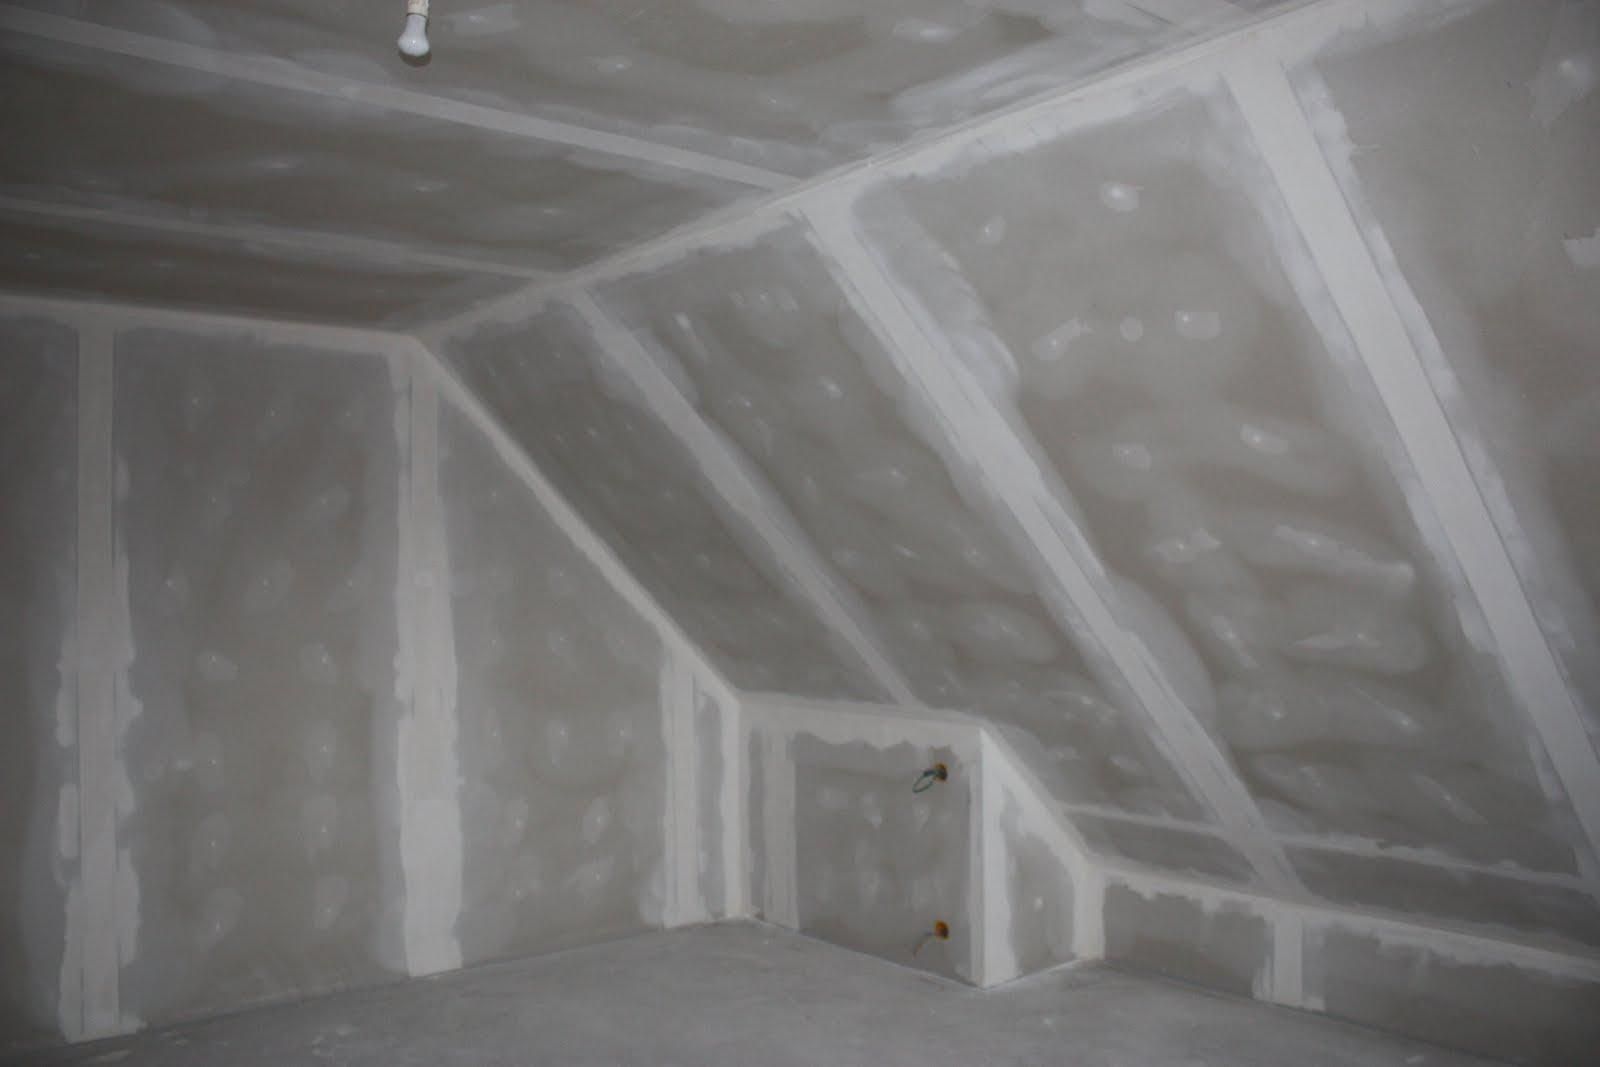 mob ossature bois isolation energie domotique bbc knx alsace placo finition des. Black Bedroom Furniture Sets. Home Design Ideas